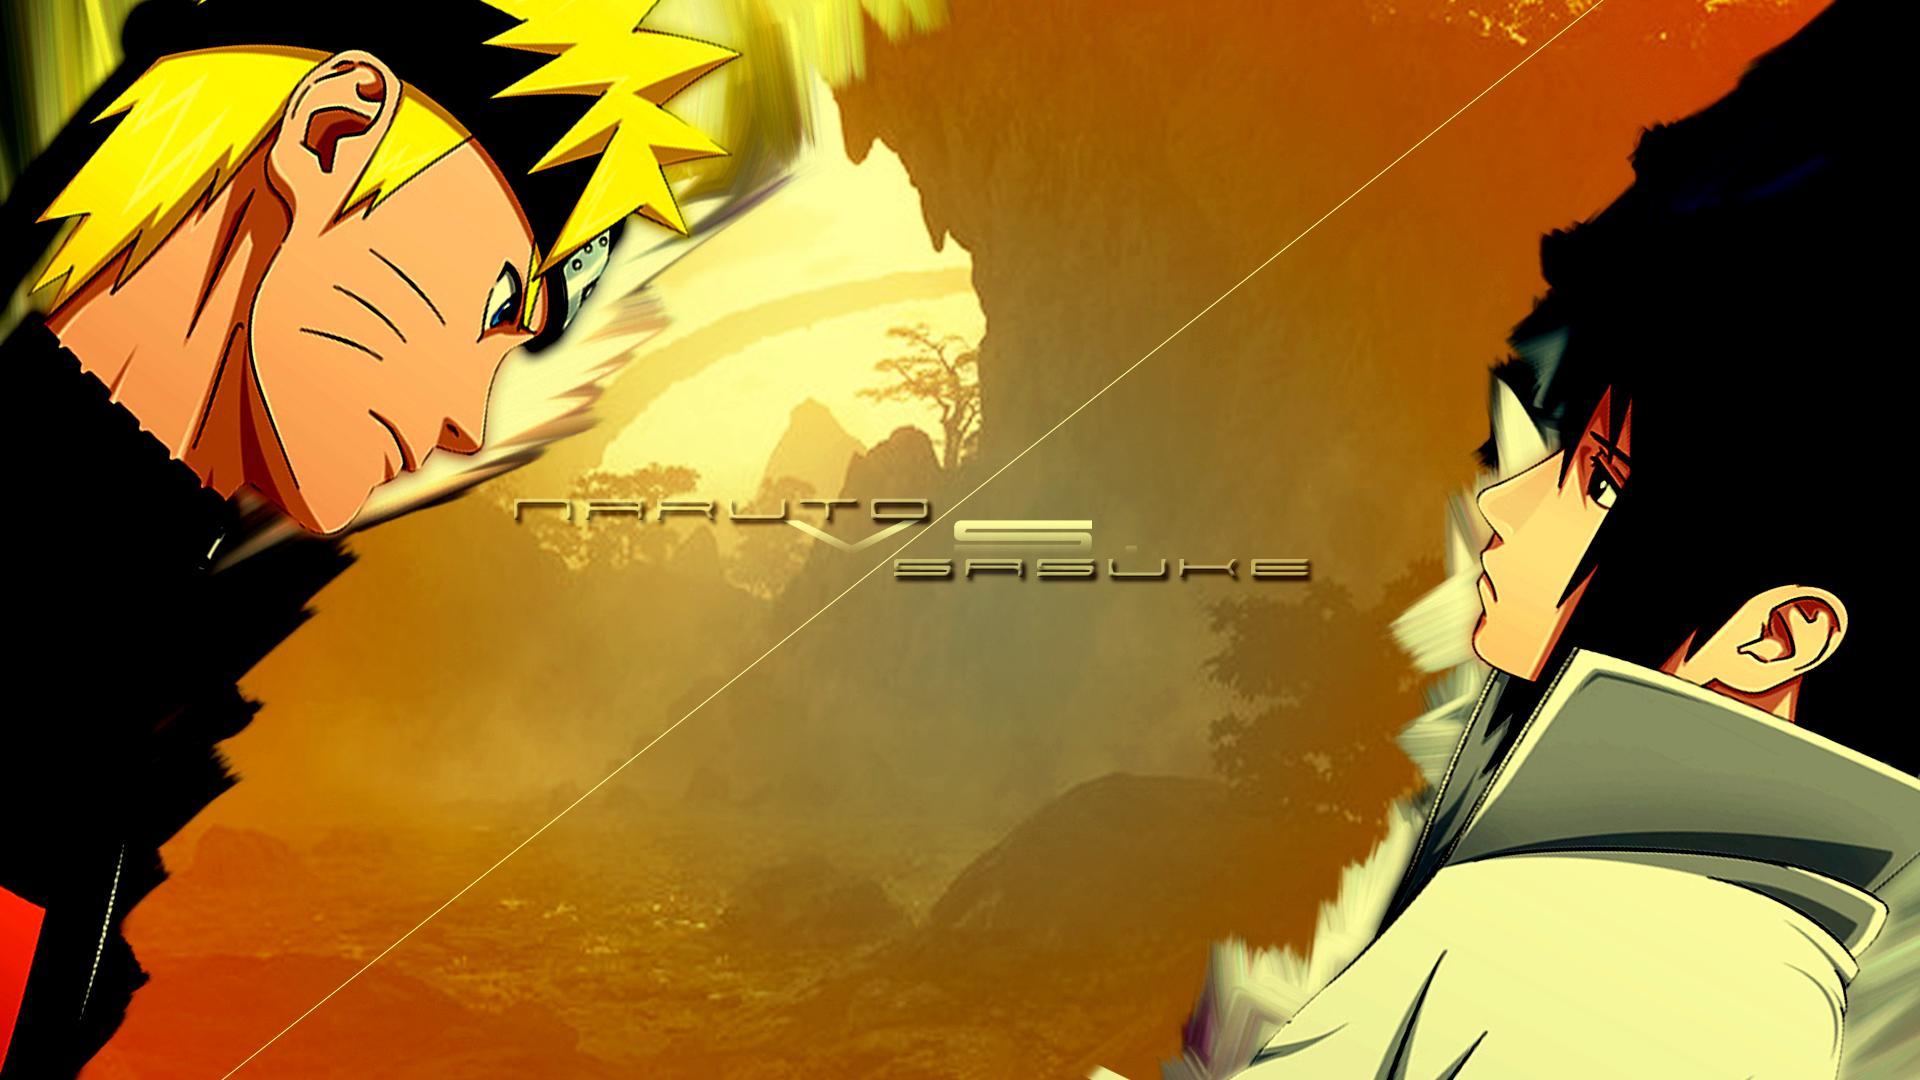 Naruto Vs Sasuke   1920x1080 19092 HD Wallpaper Res 1920x1080 1920x1080